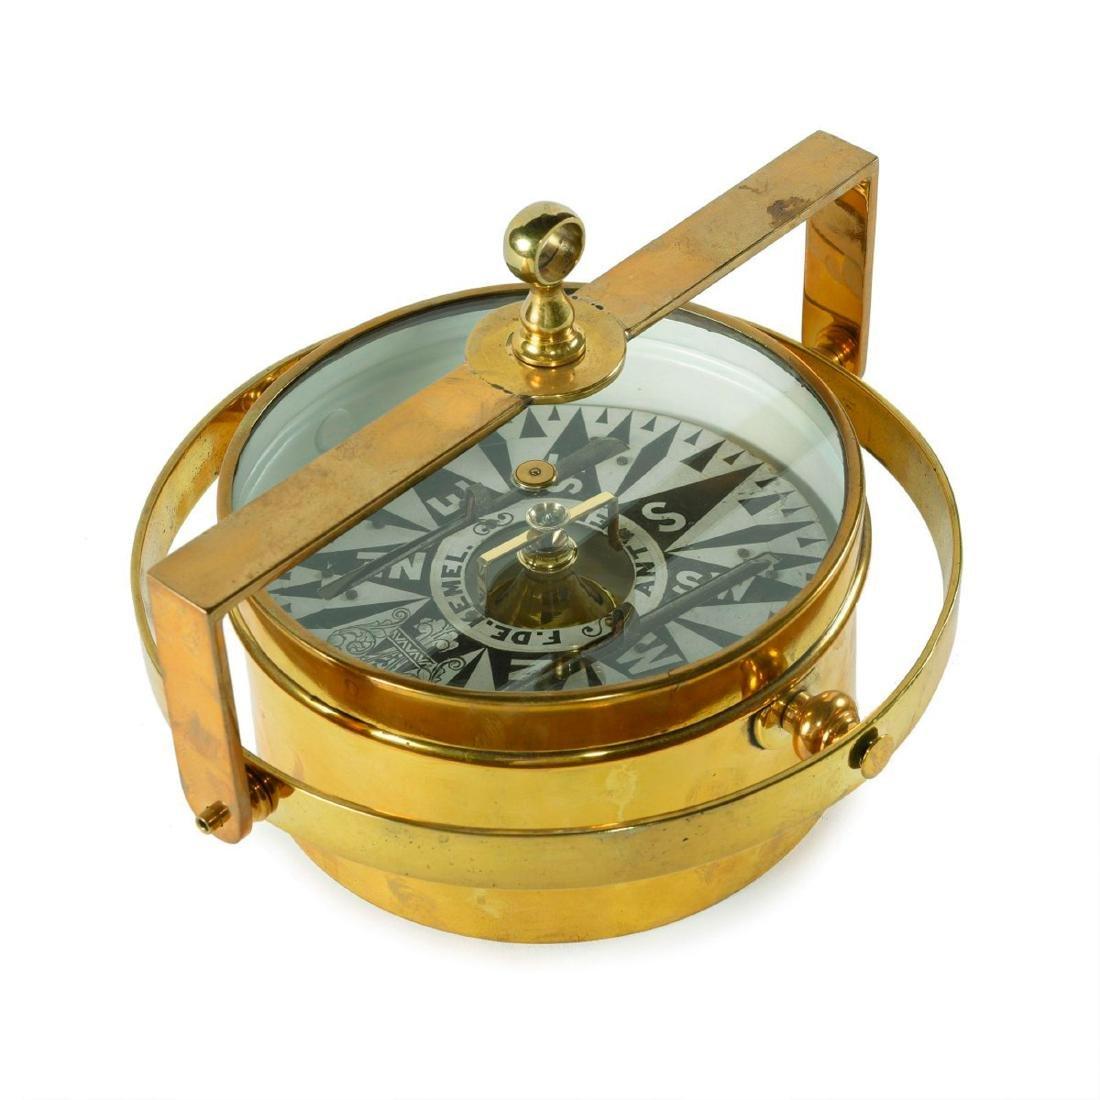 Gimballed compass